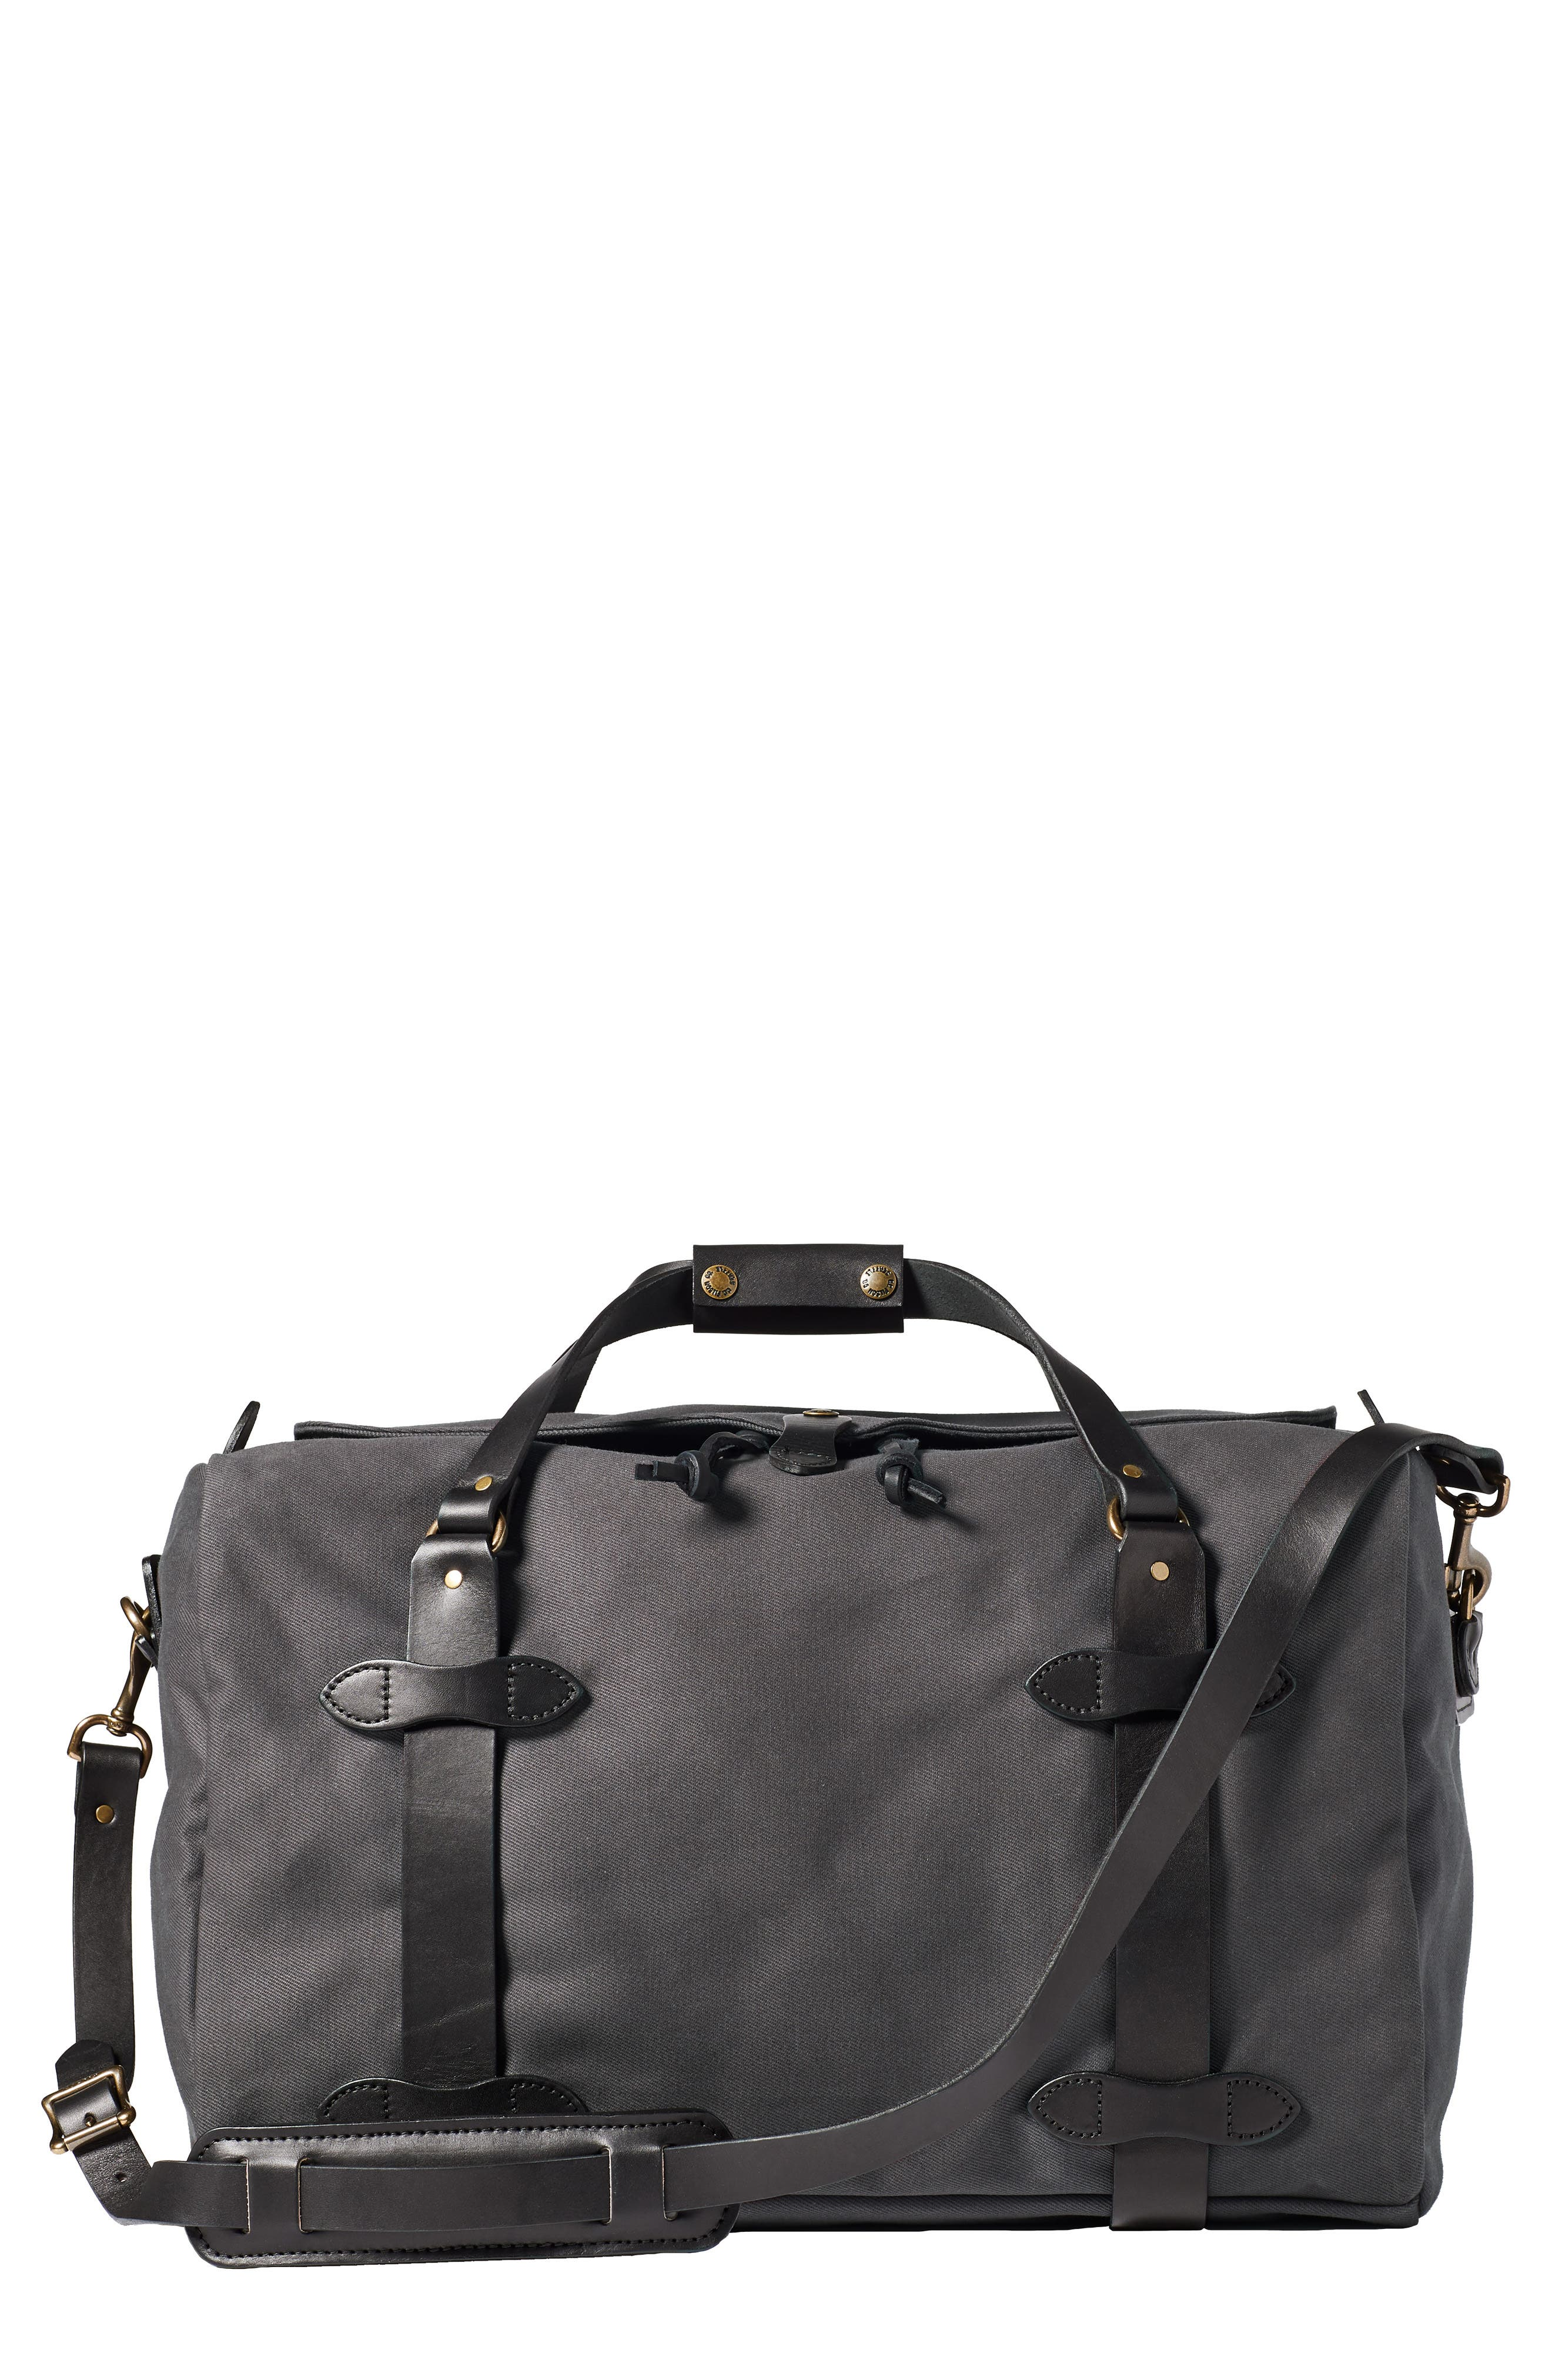 Medium Duffel Bag,                         Main,                         color, CINDER